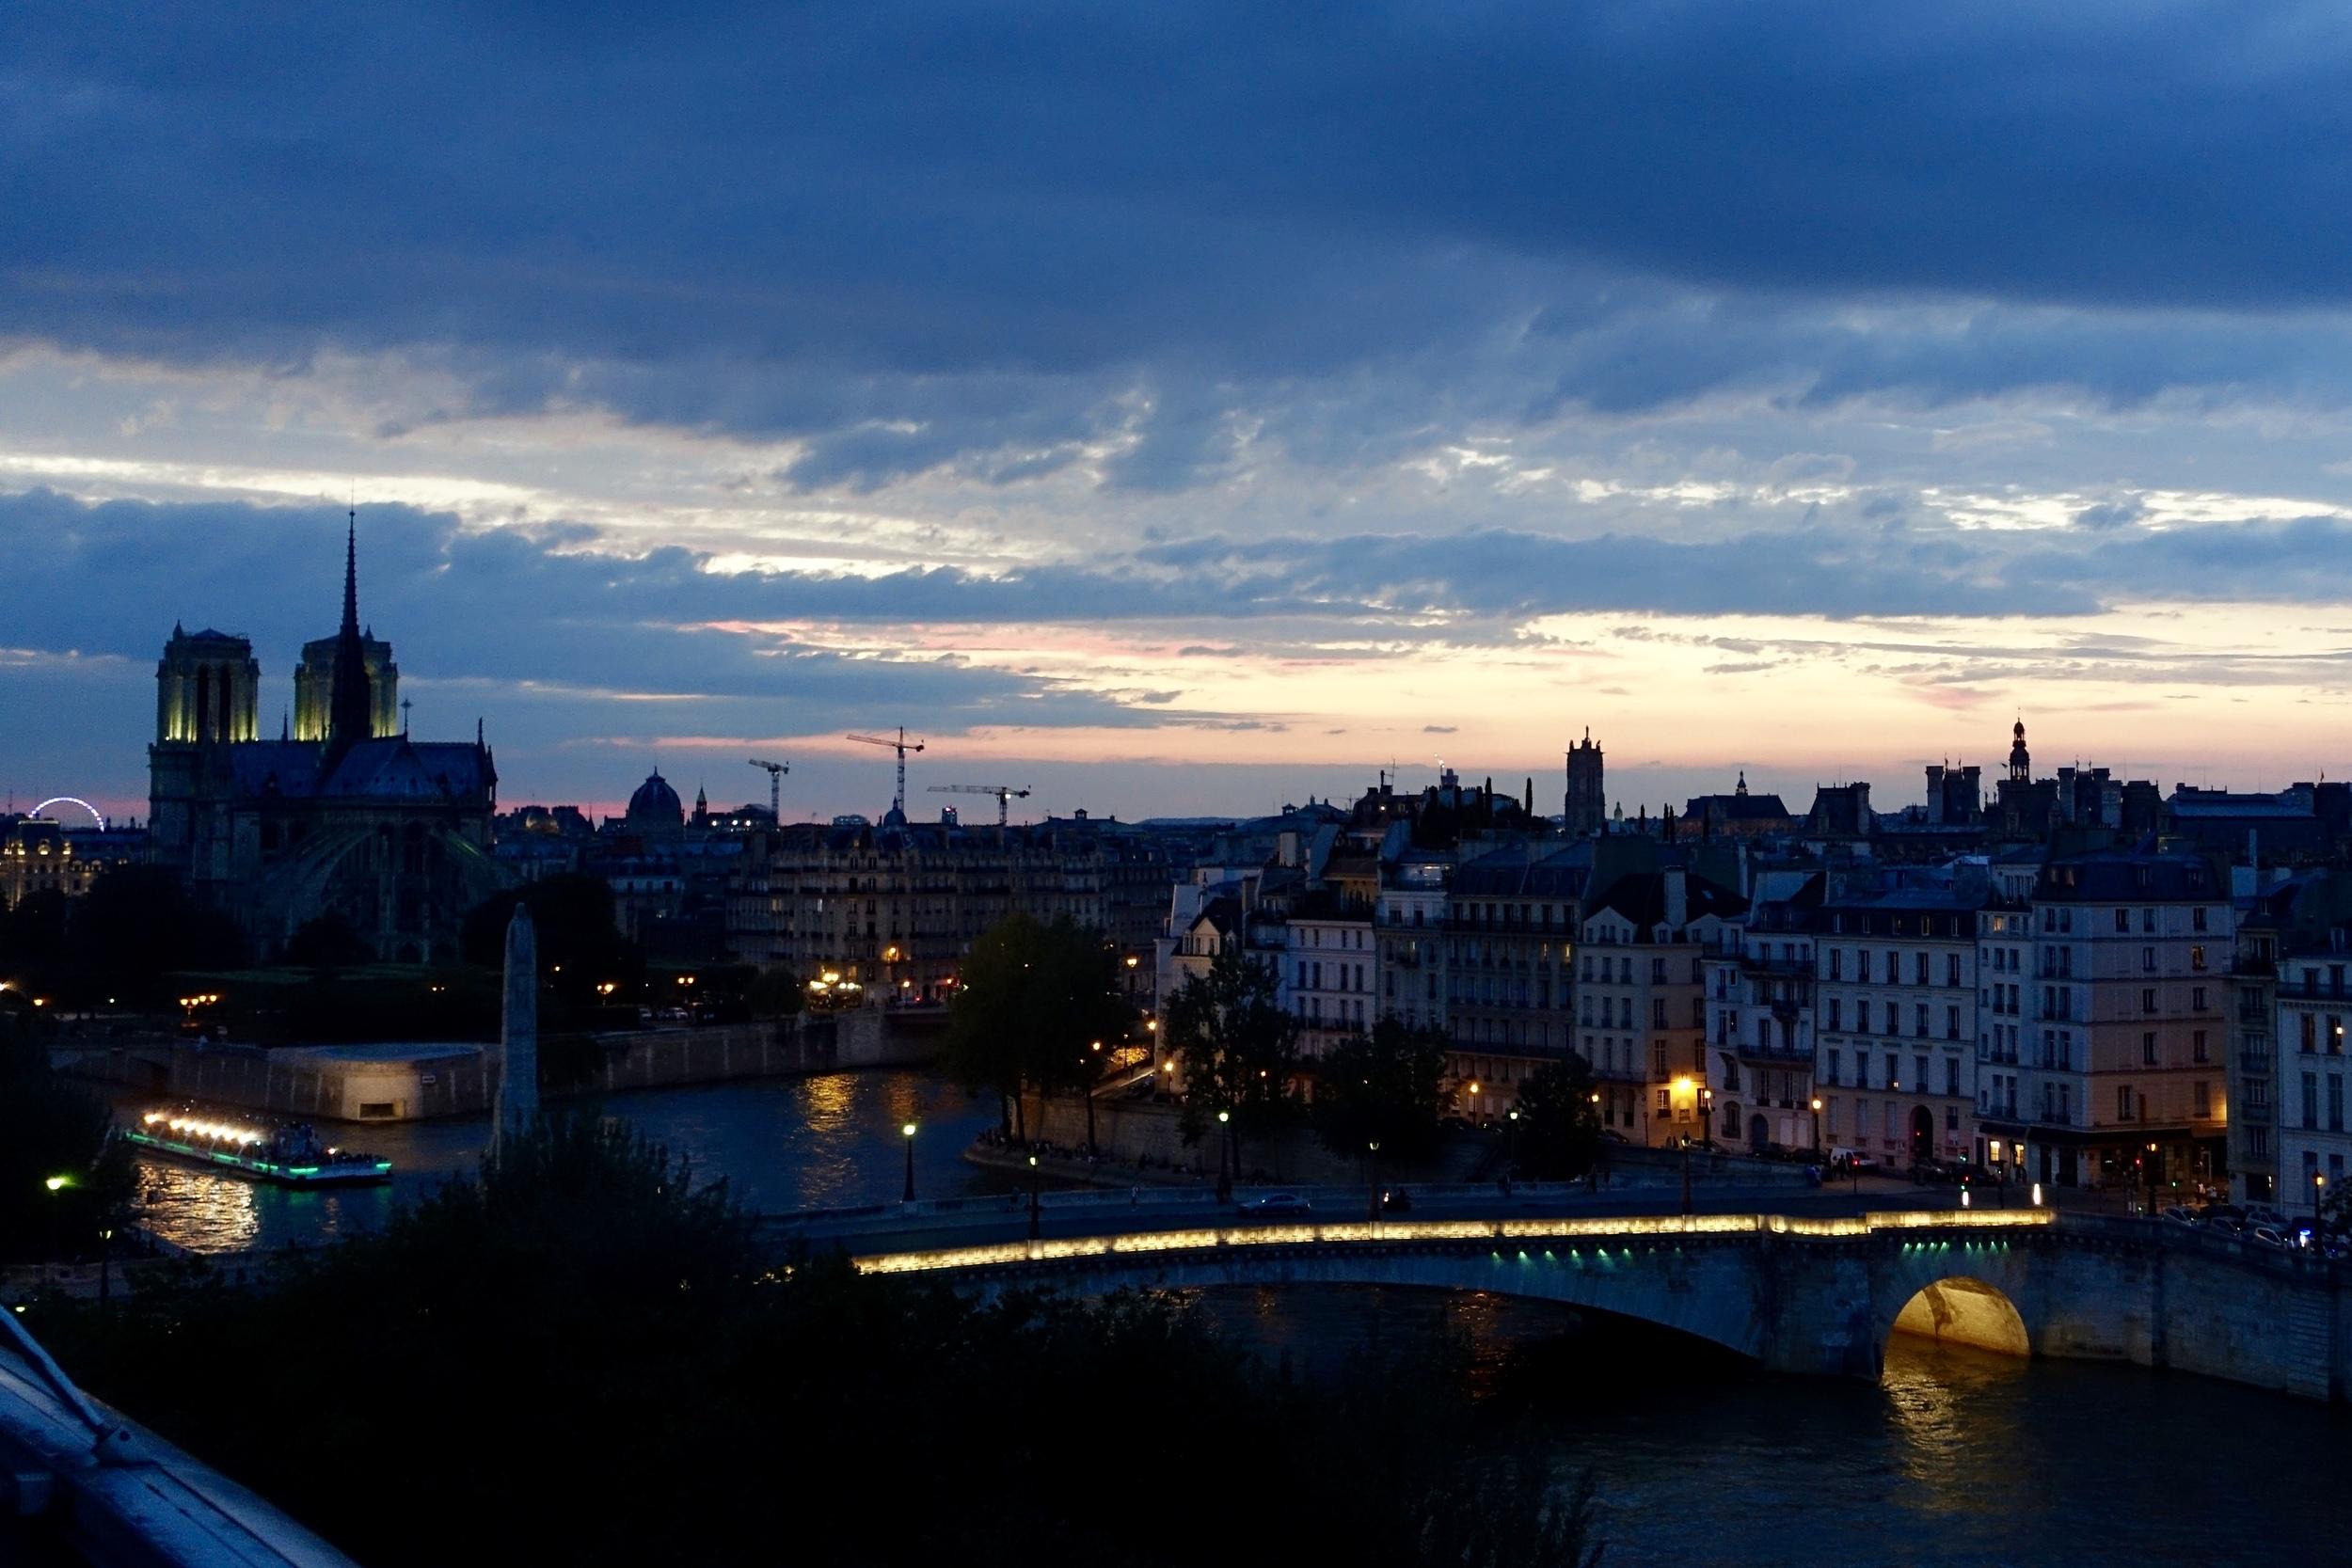 Paris - Explore the City of Light Like Never Before